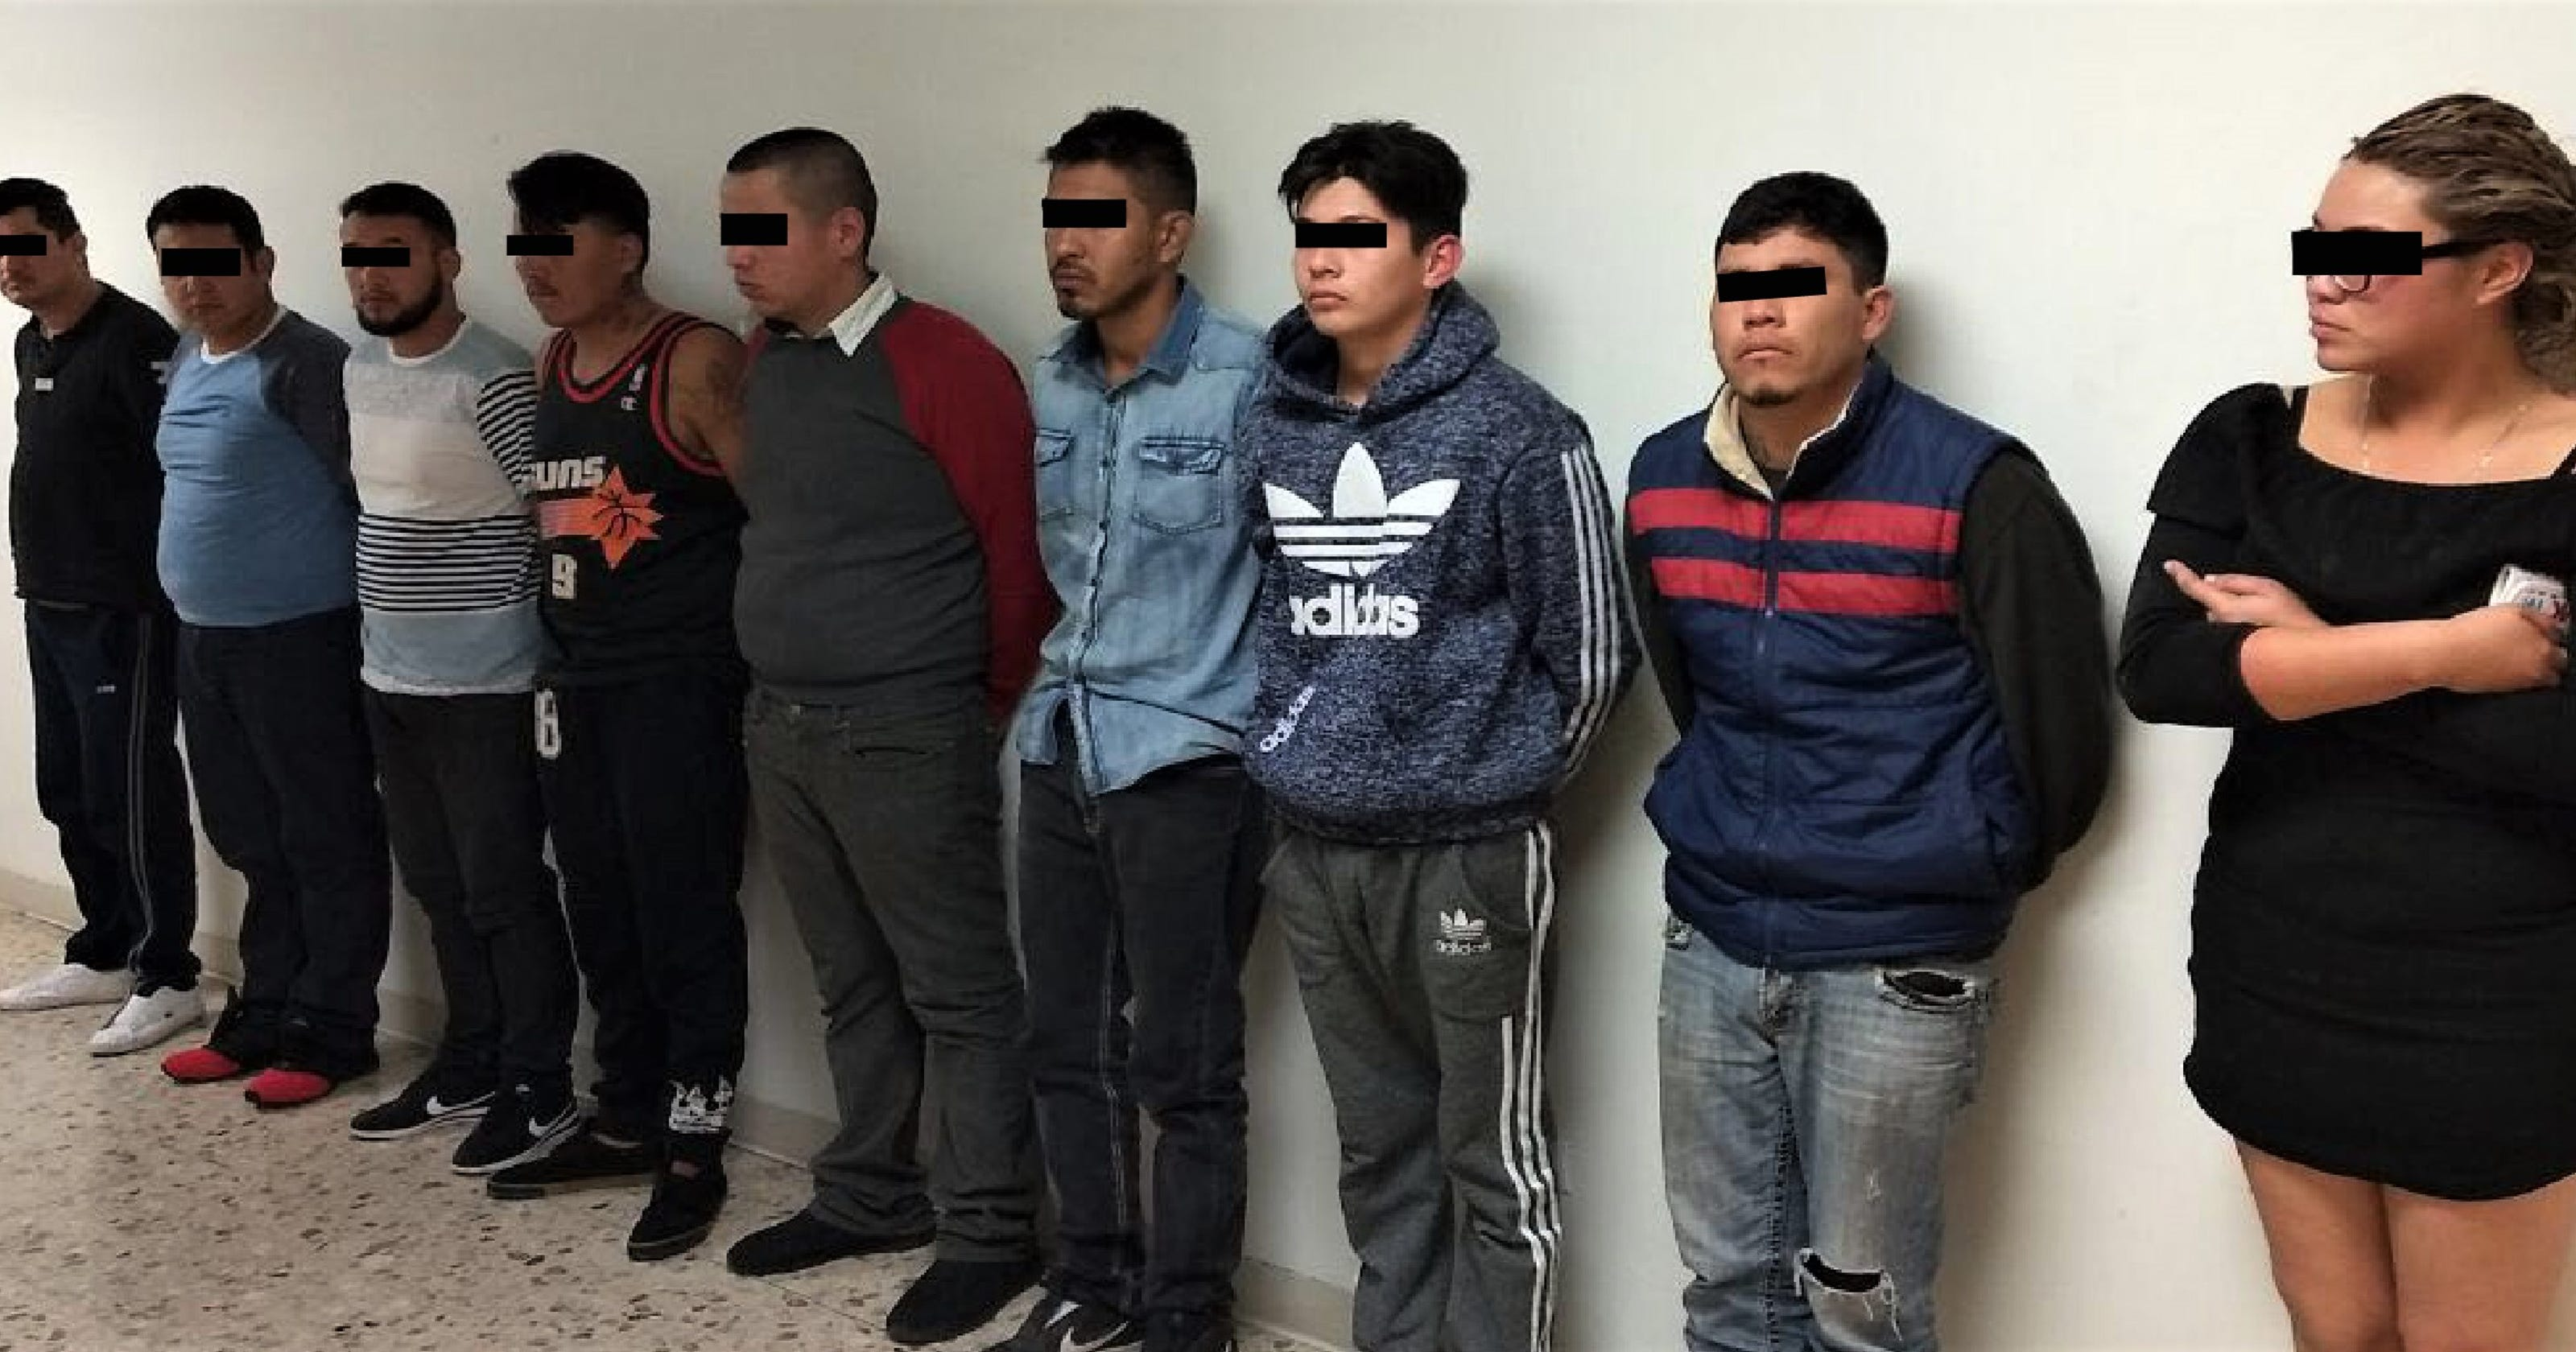 Body in suitcase in Juárez